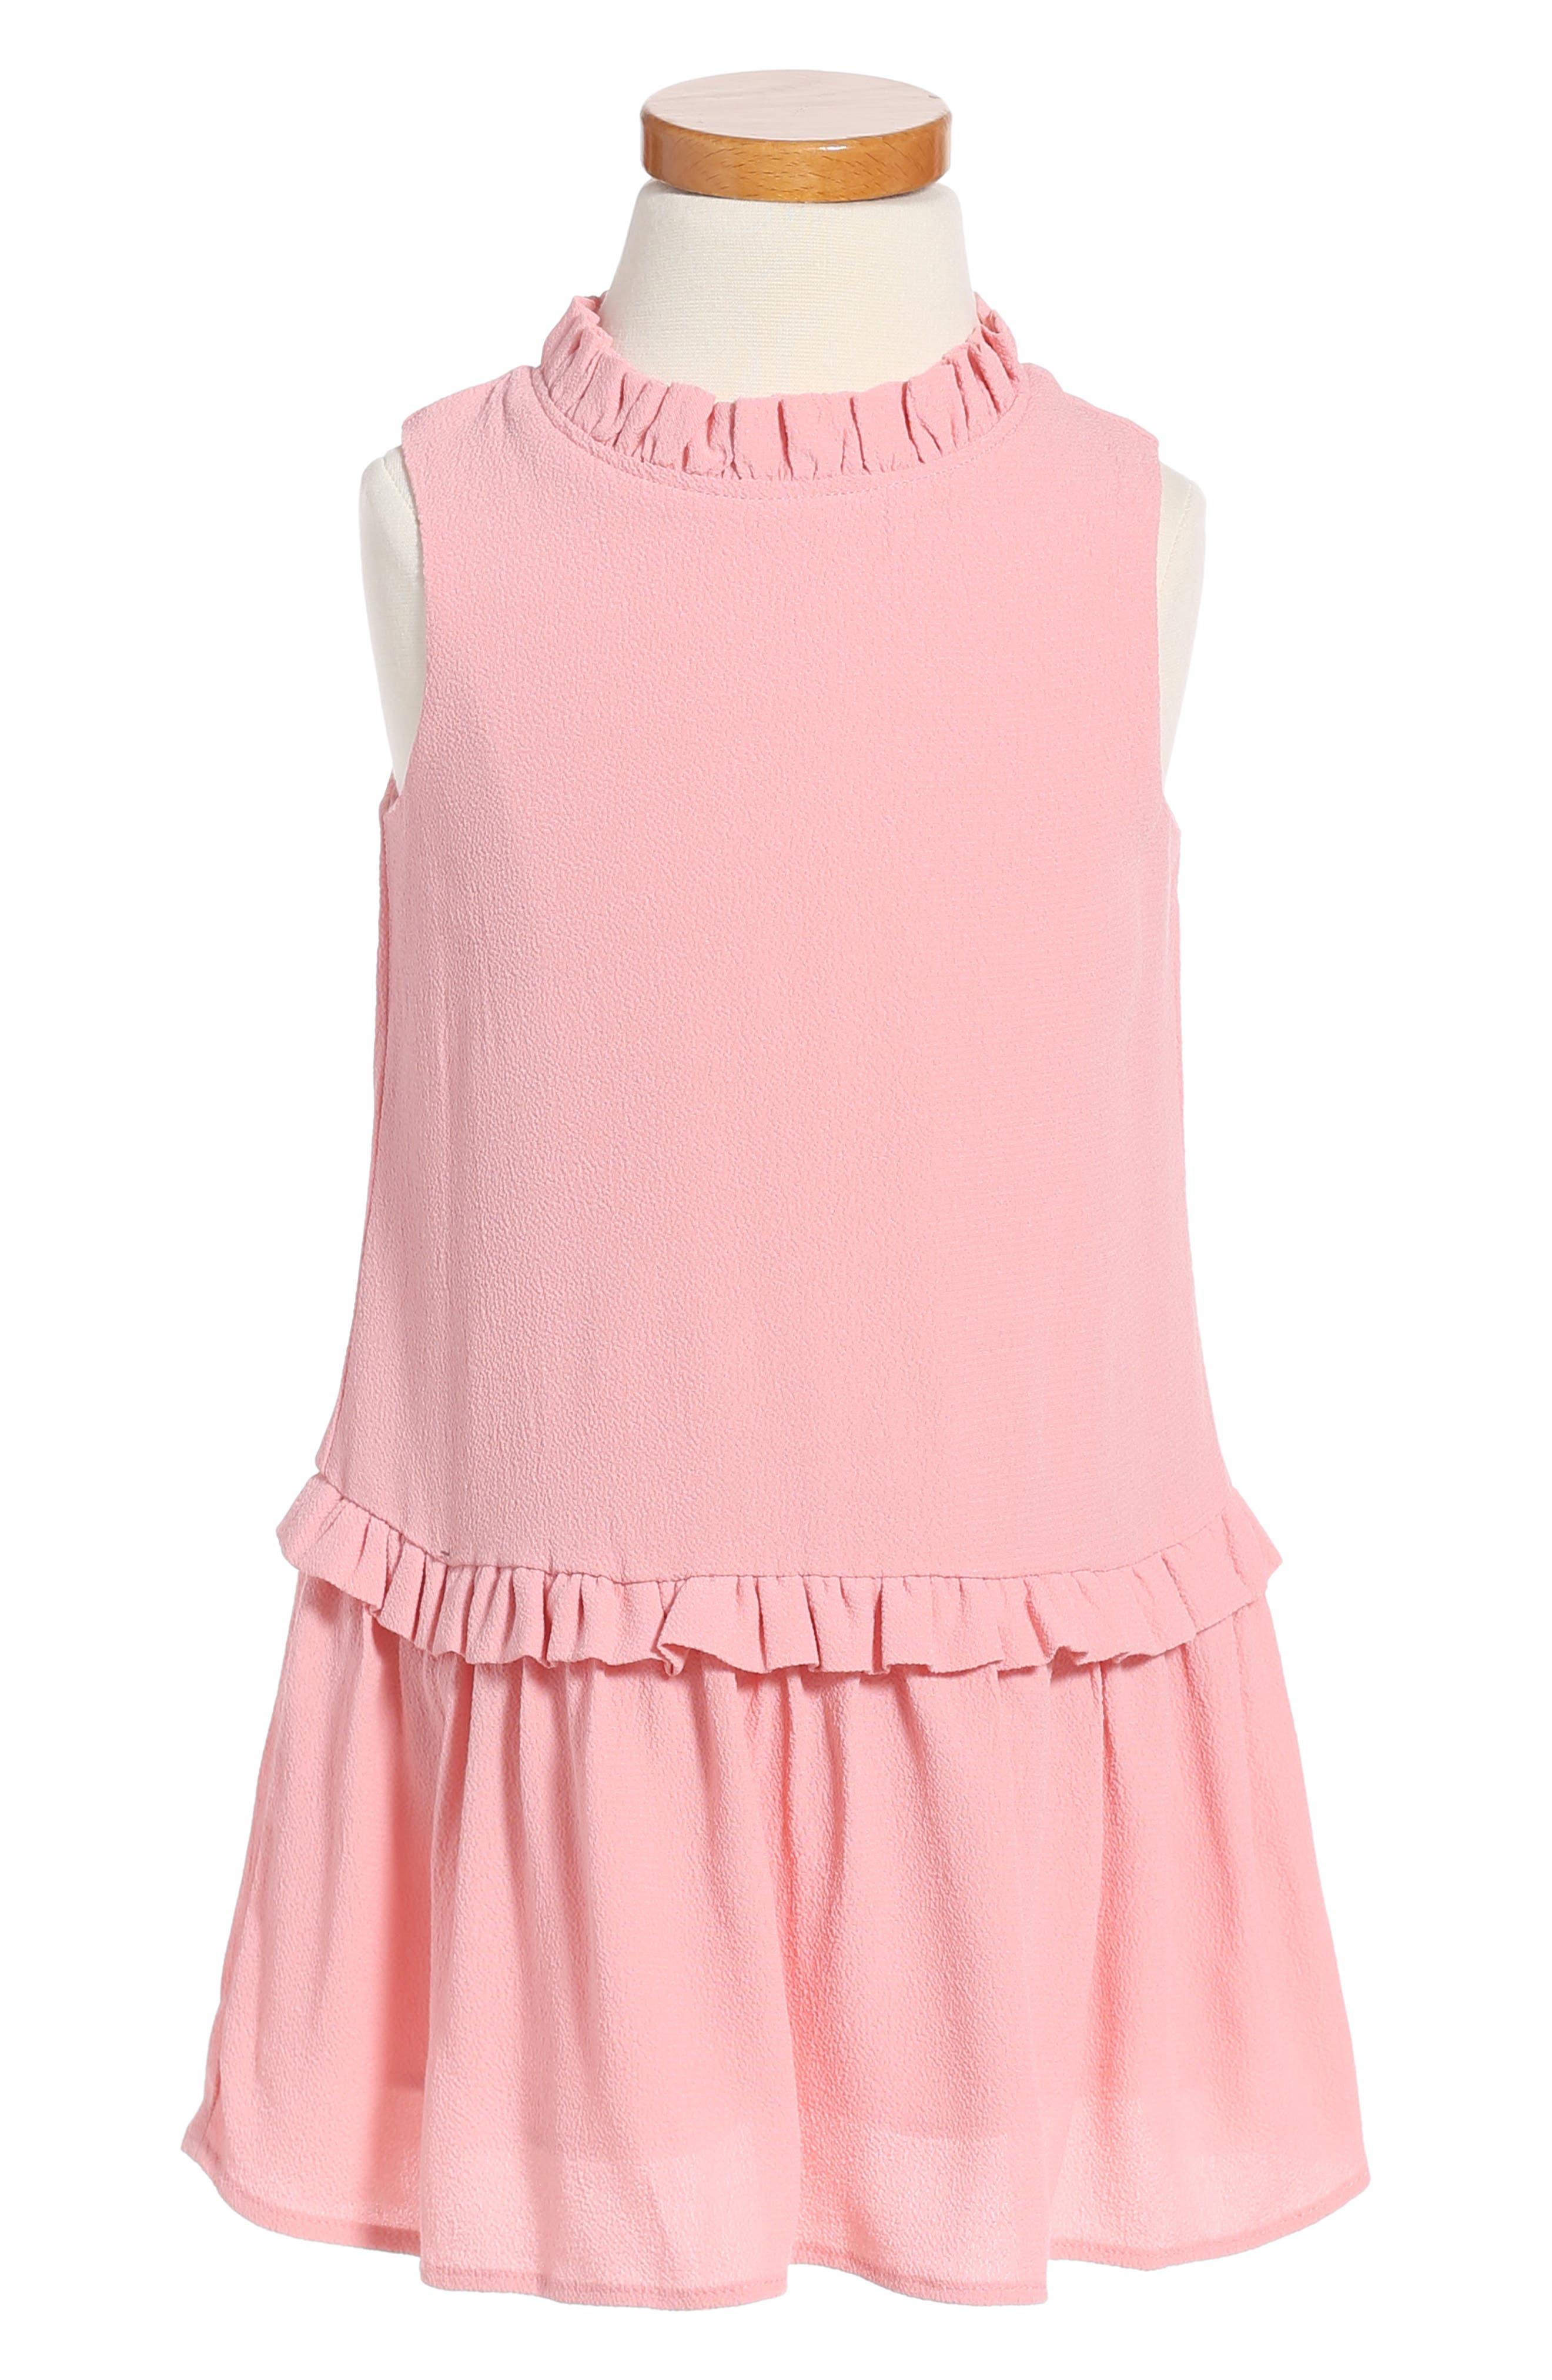 Main Image - kate spade new york ruffle collar dress (Toddler Girls & Little Girls)